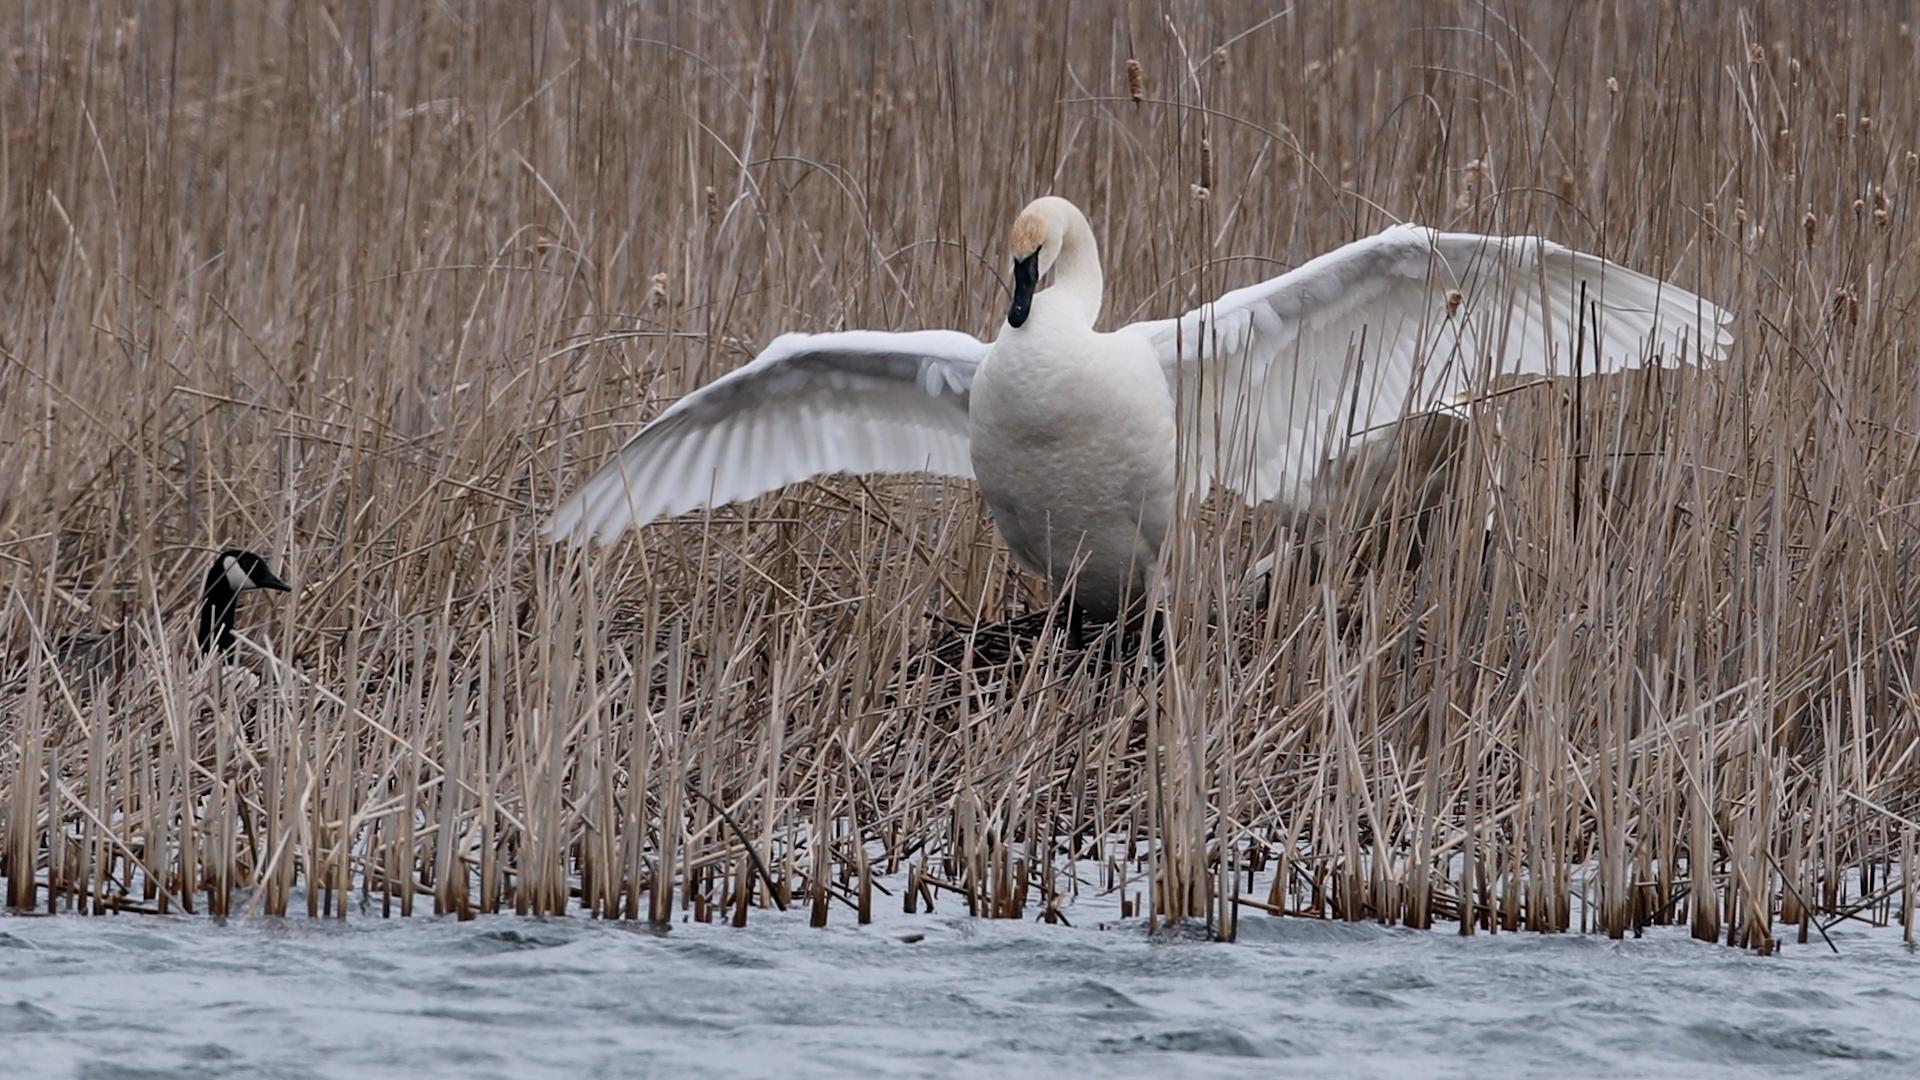 Nesting Trumpeter Swan photo Minnesota